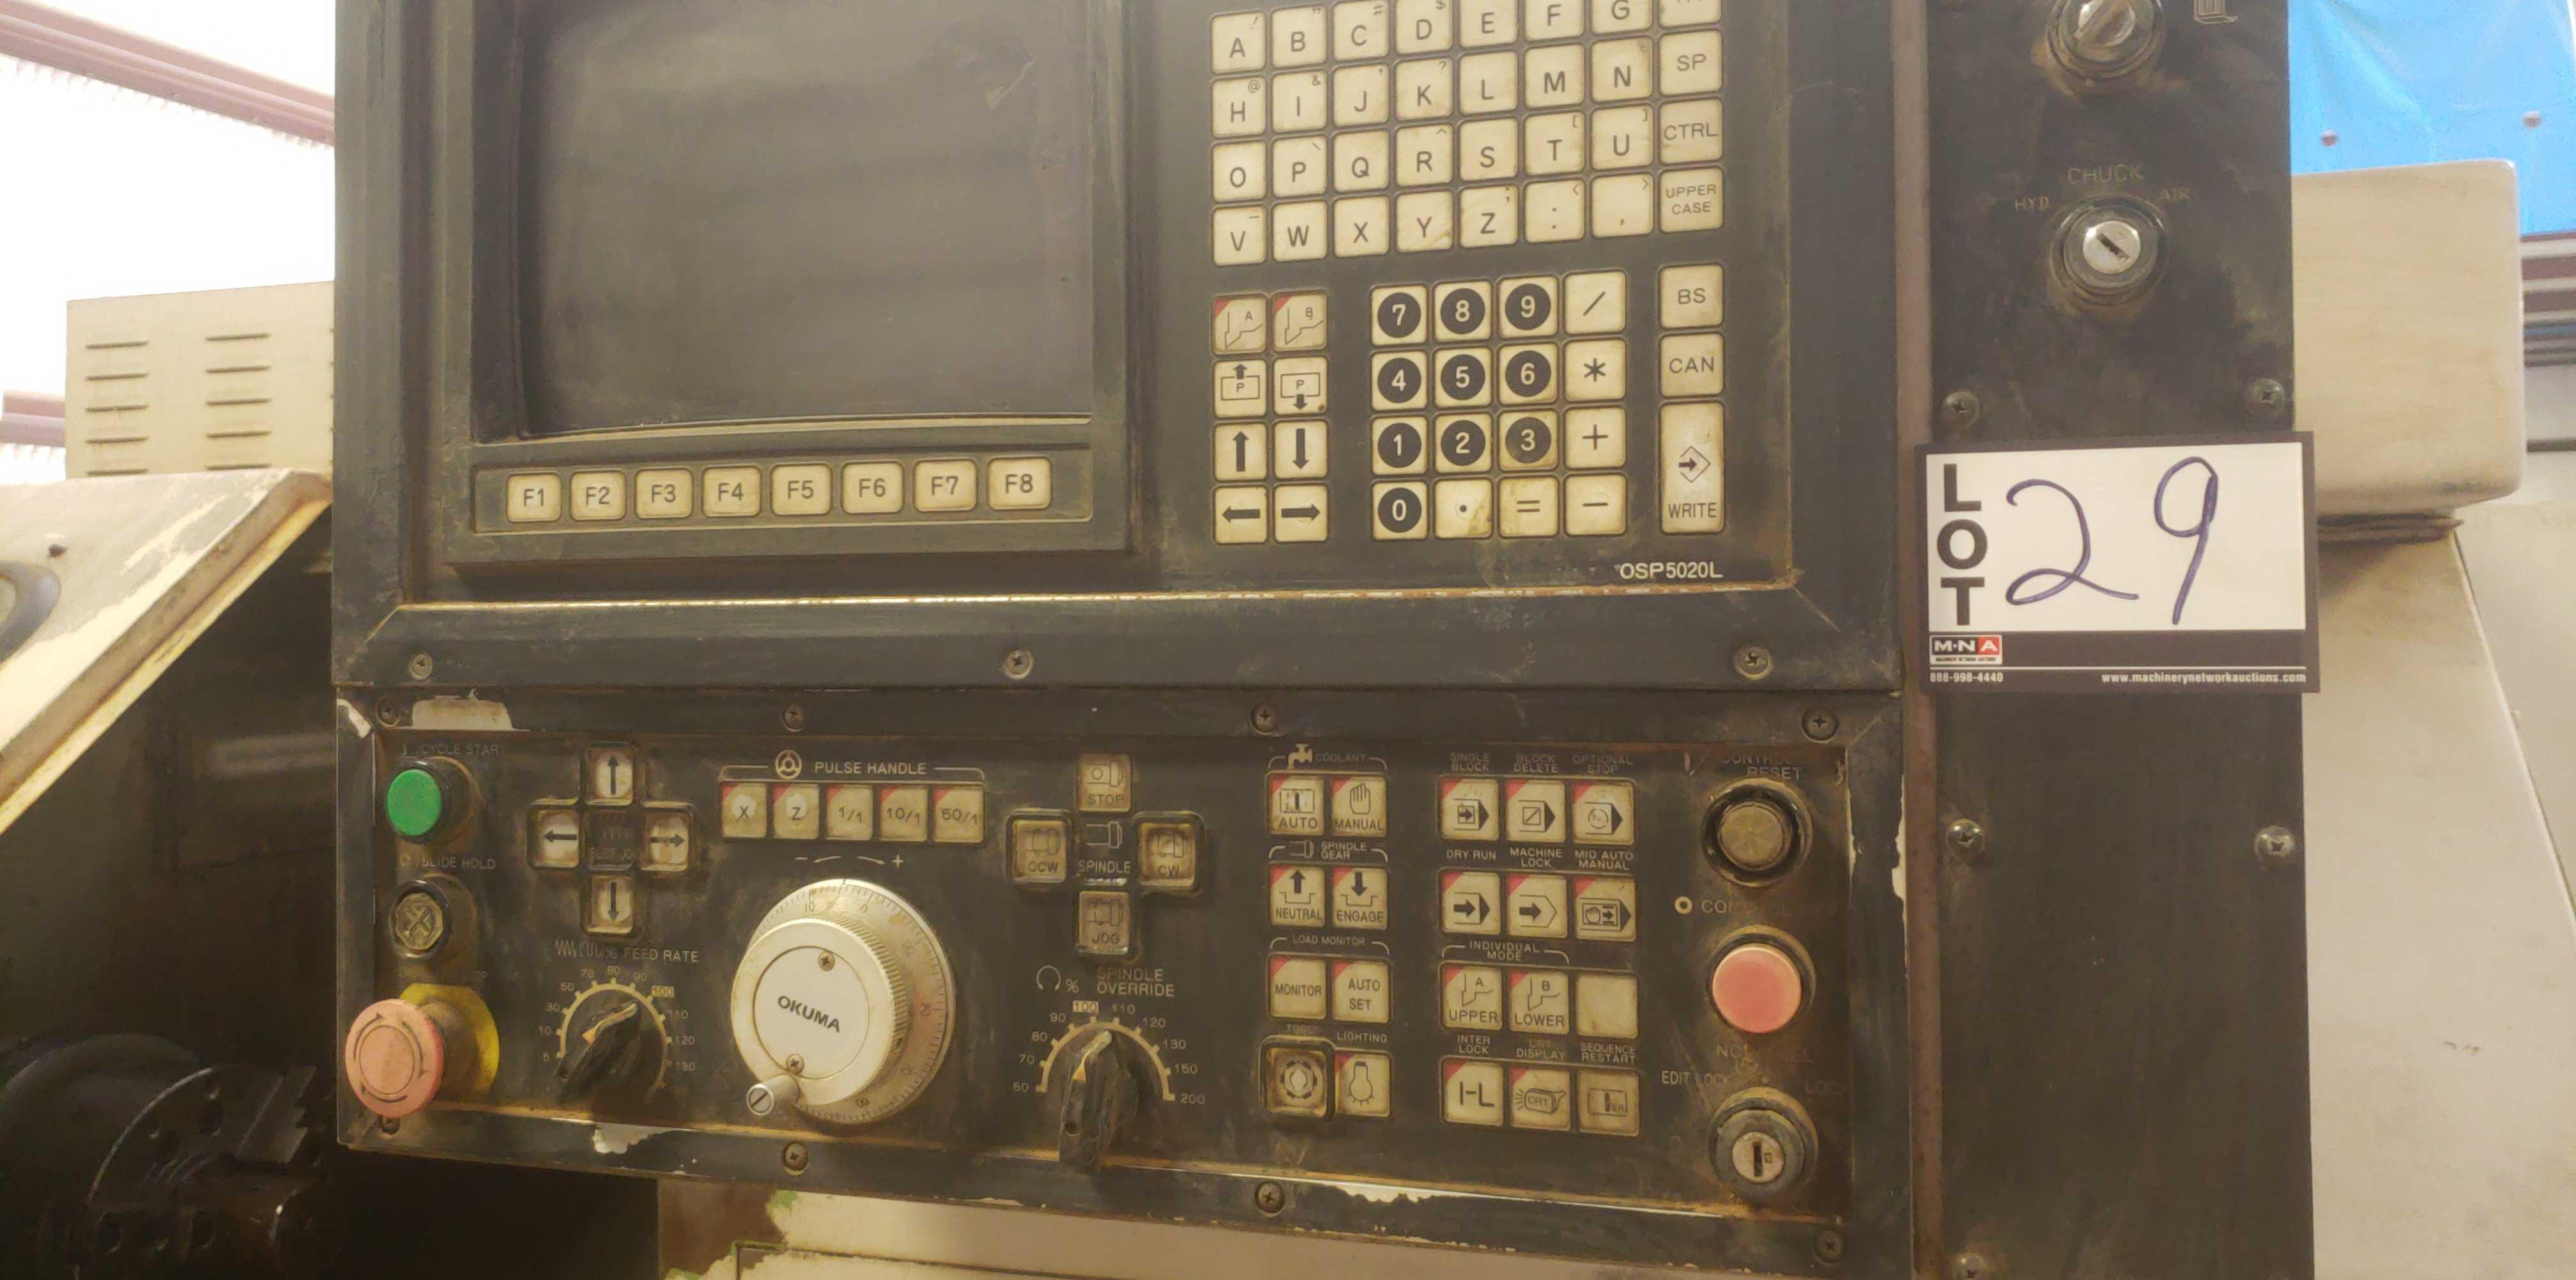 "Okuma LB 25 2 Axis CNC lathe, 5020 control, chip conveyor, 10"" chuck SN: 06119625 - Image 3 of 7"